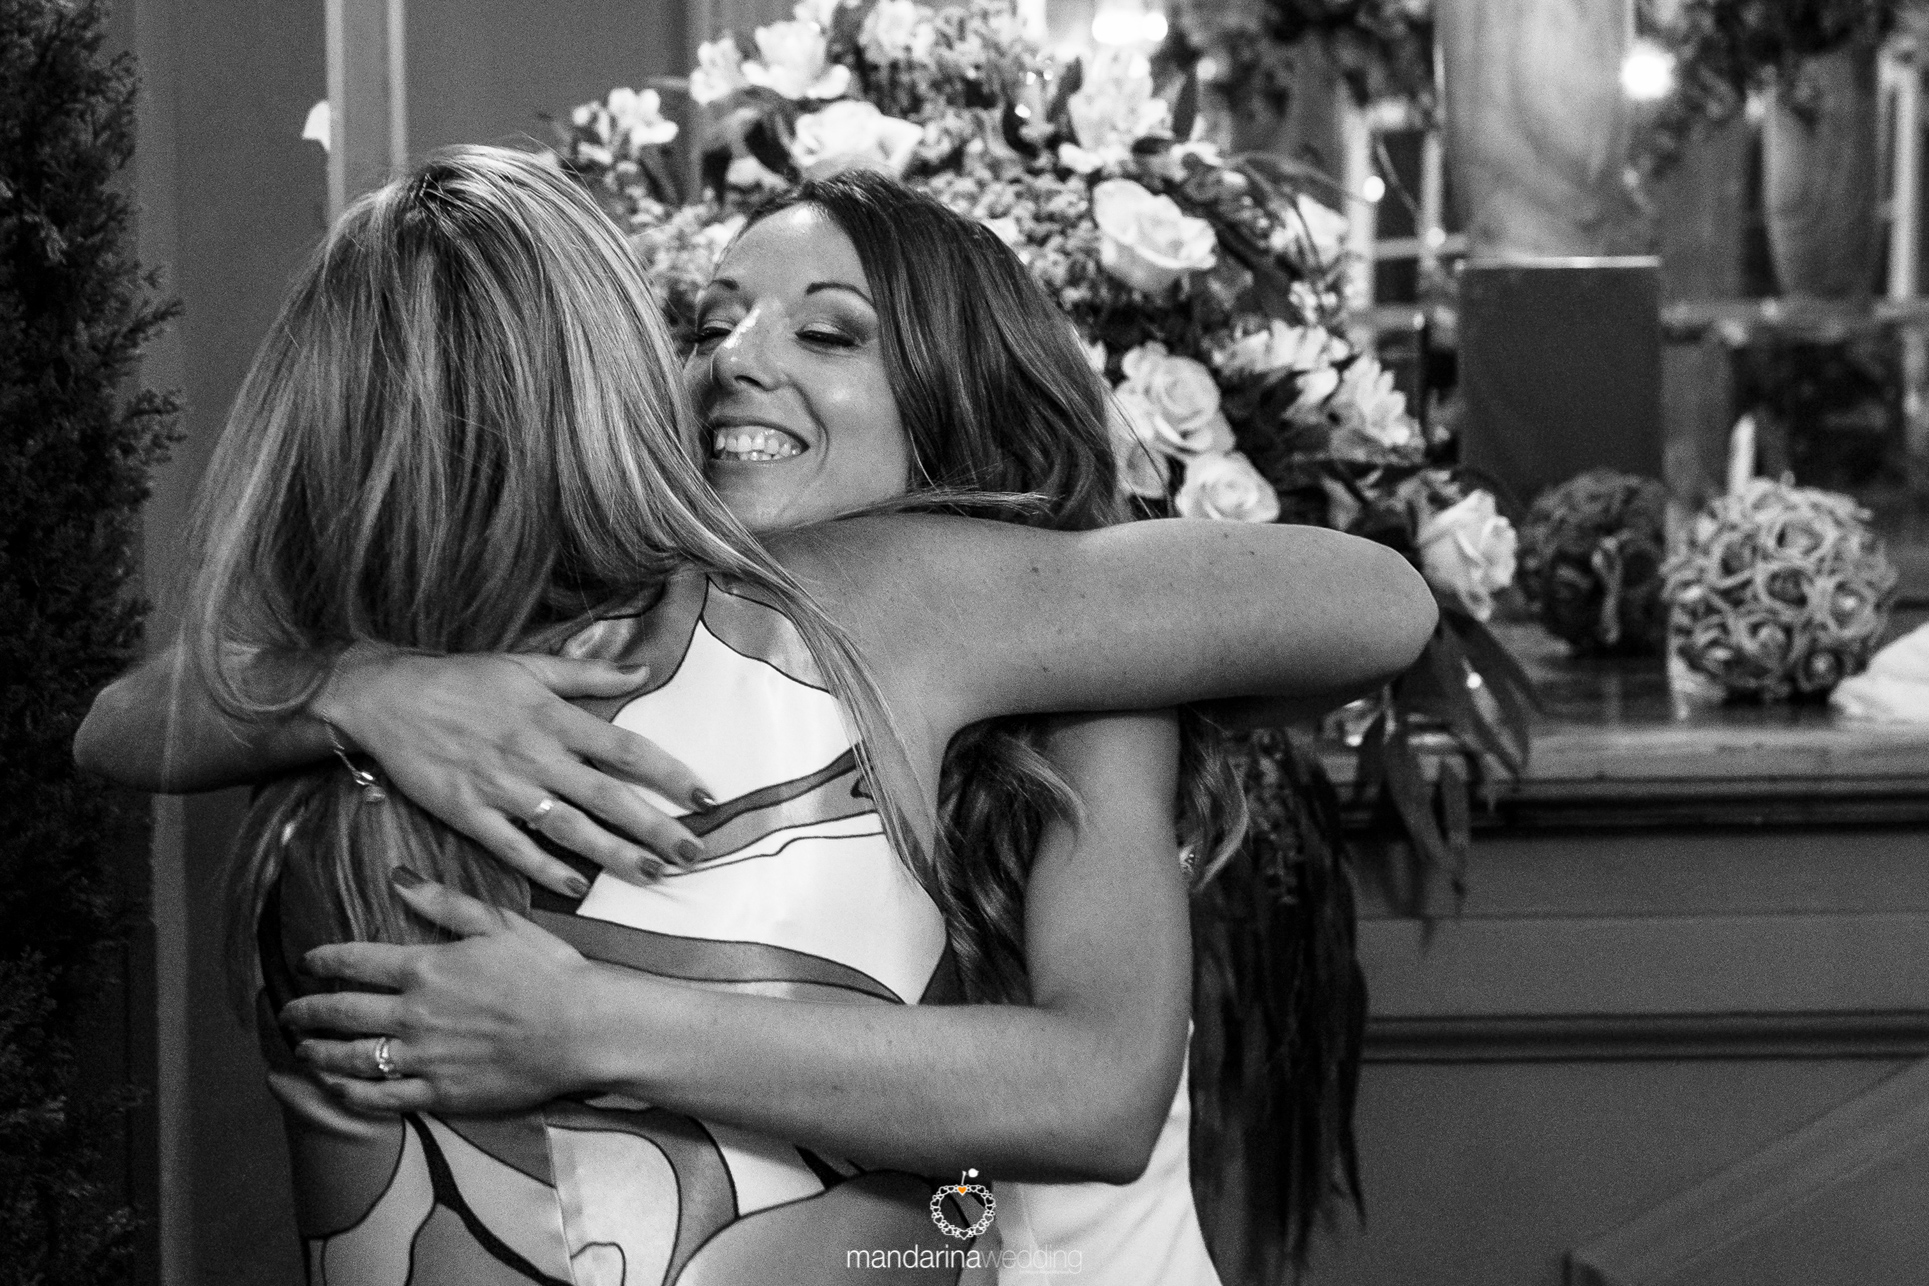 mandarina wedding, fotografo boda pais vasco, fotografo boda zaragoza, fotógrafo boda soria, fotografo boda Madrid, fotógrafo boda tarragona-25